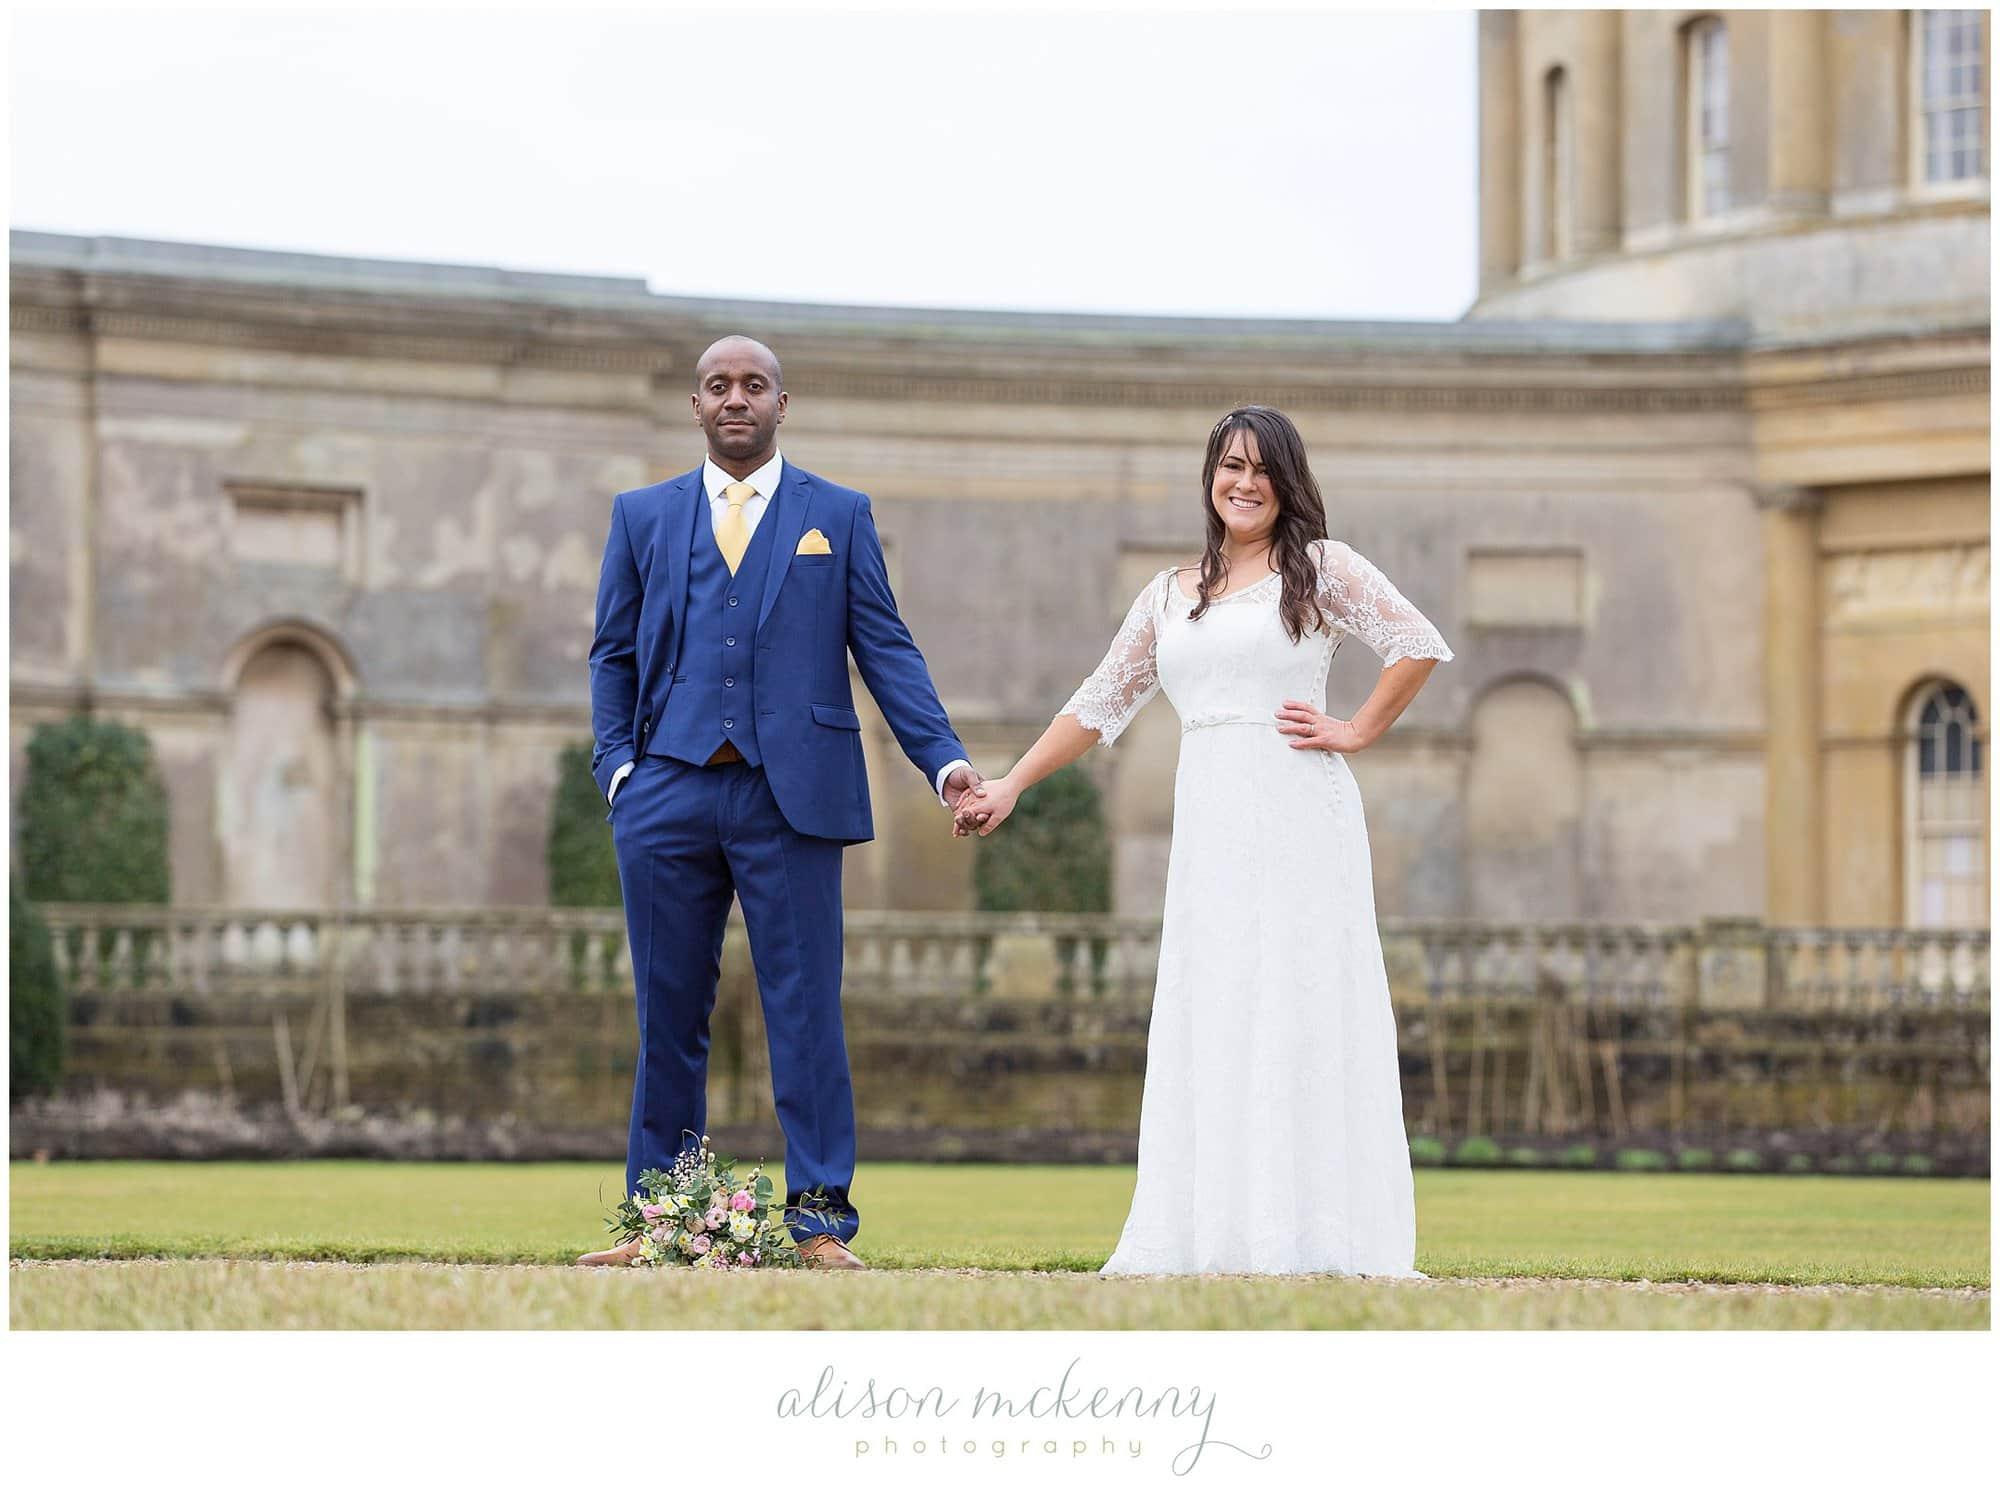 Robby and Carolines Wedding Day at Ickworth Hotel, Bury St Edmunds ...